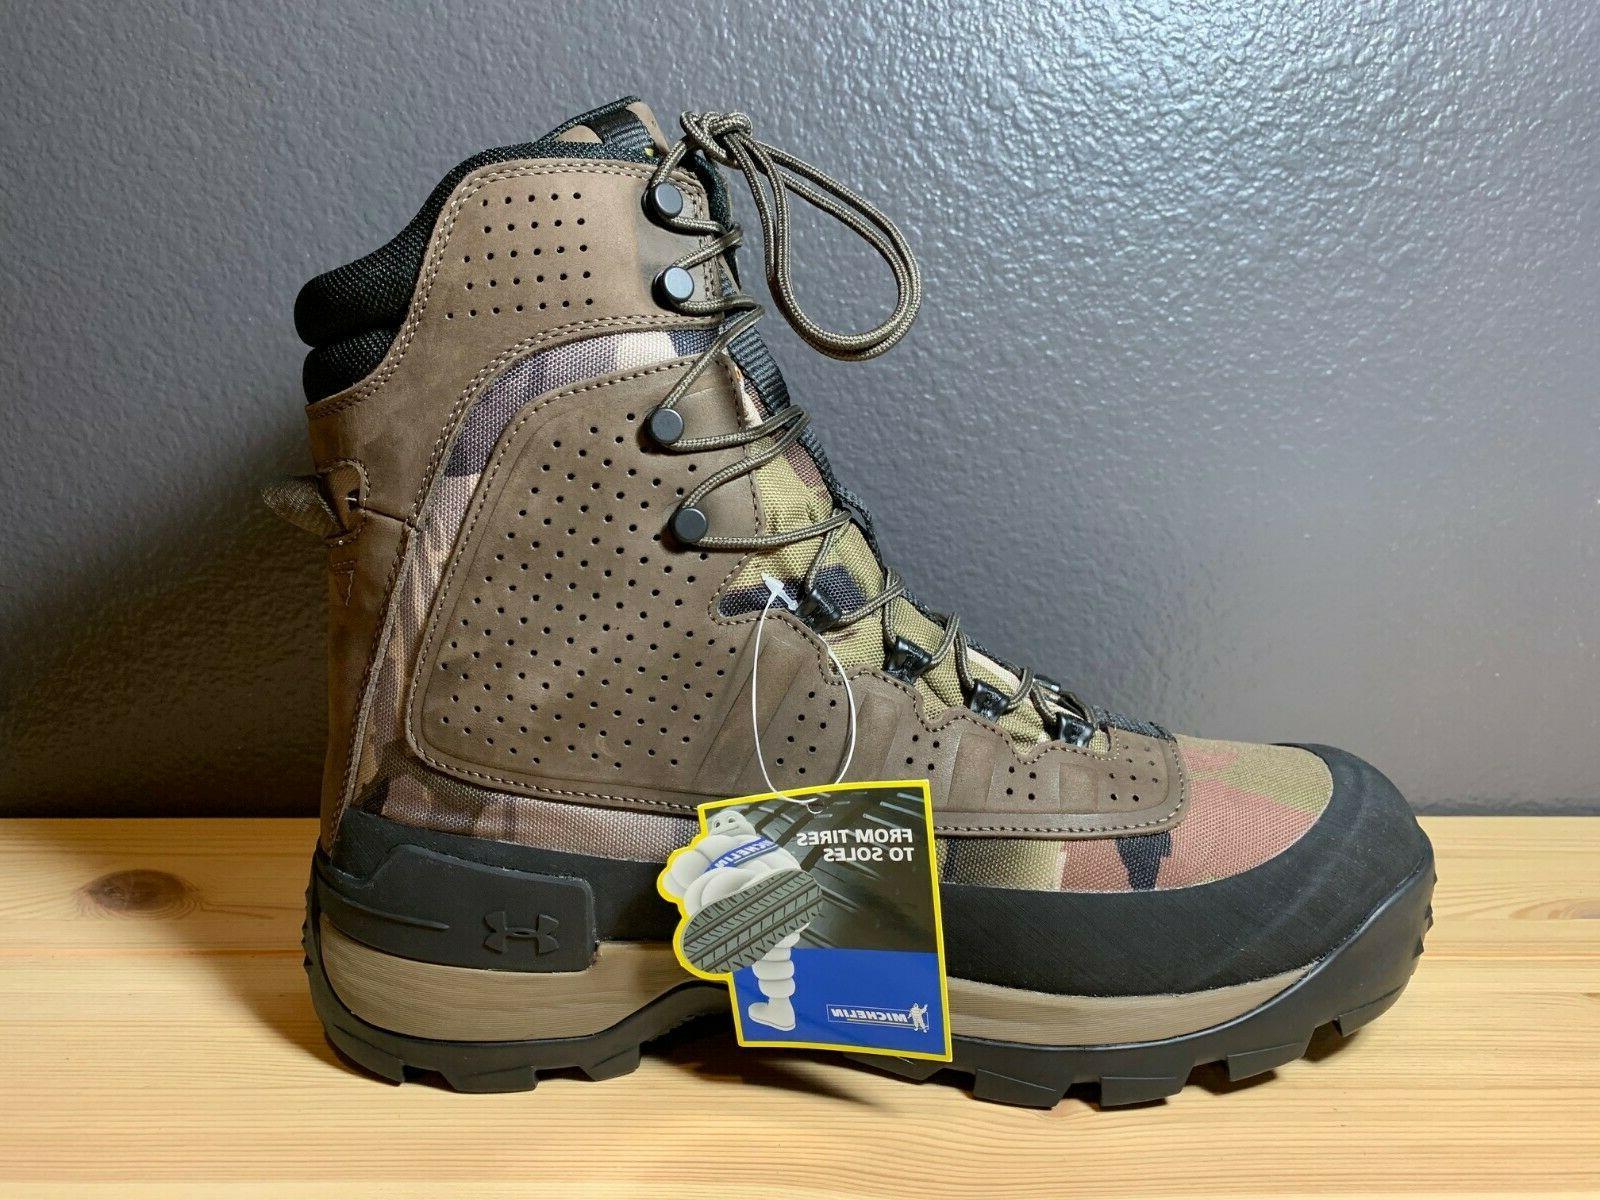 Men's Tine Boots 3000292-901